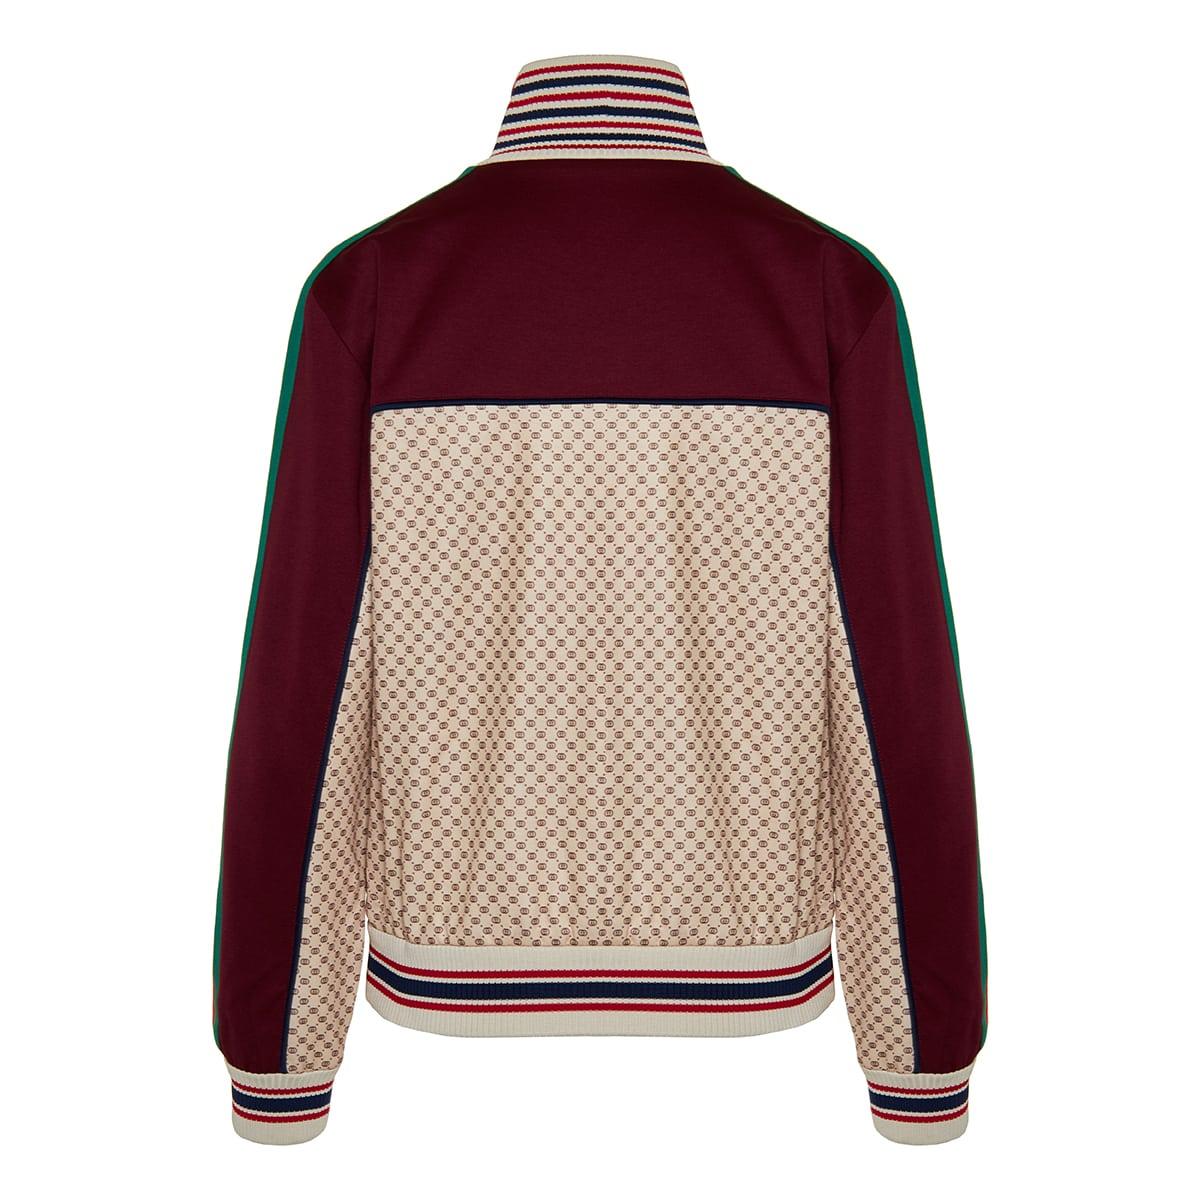 GG jersey track jacket